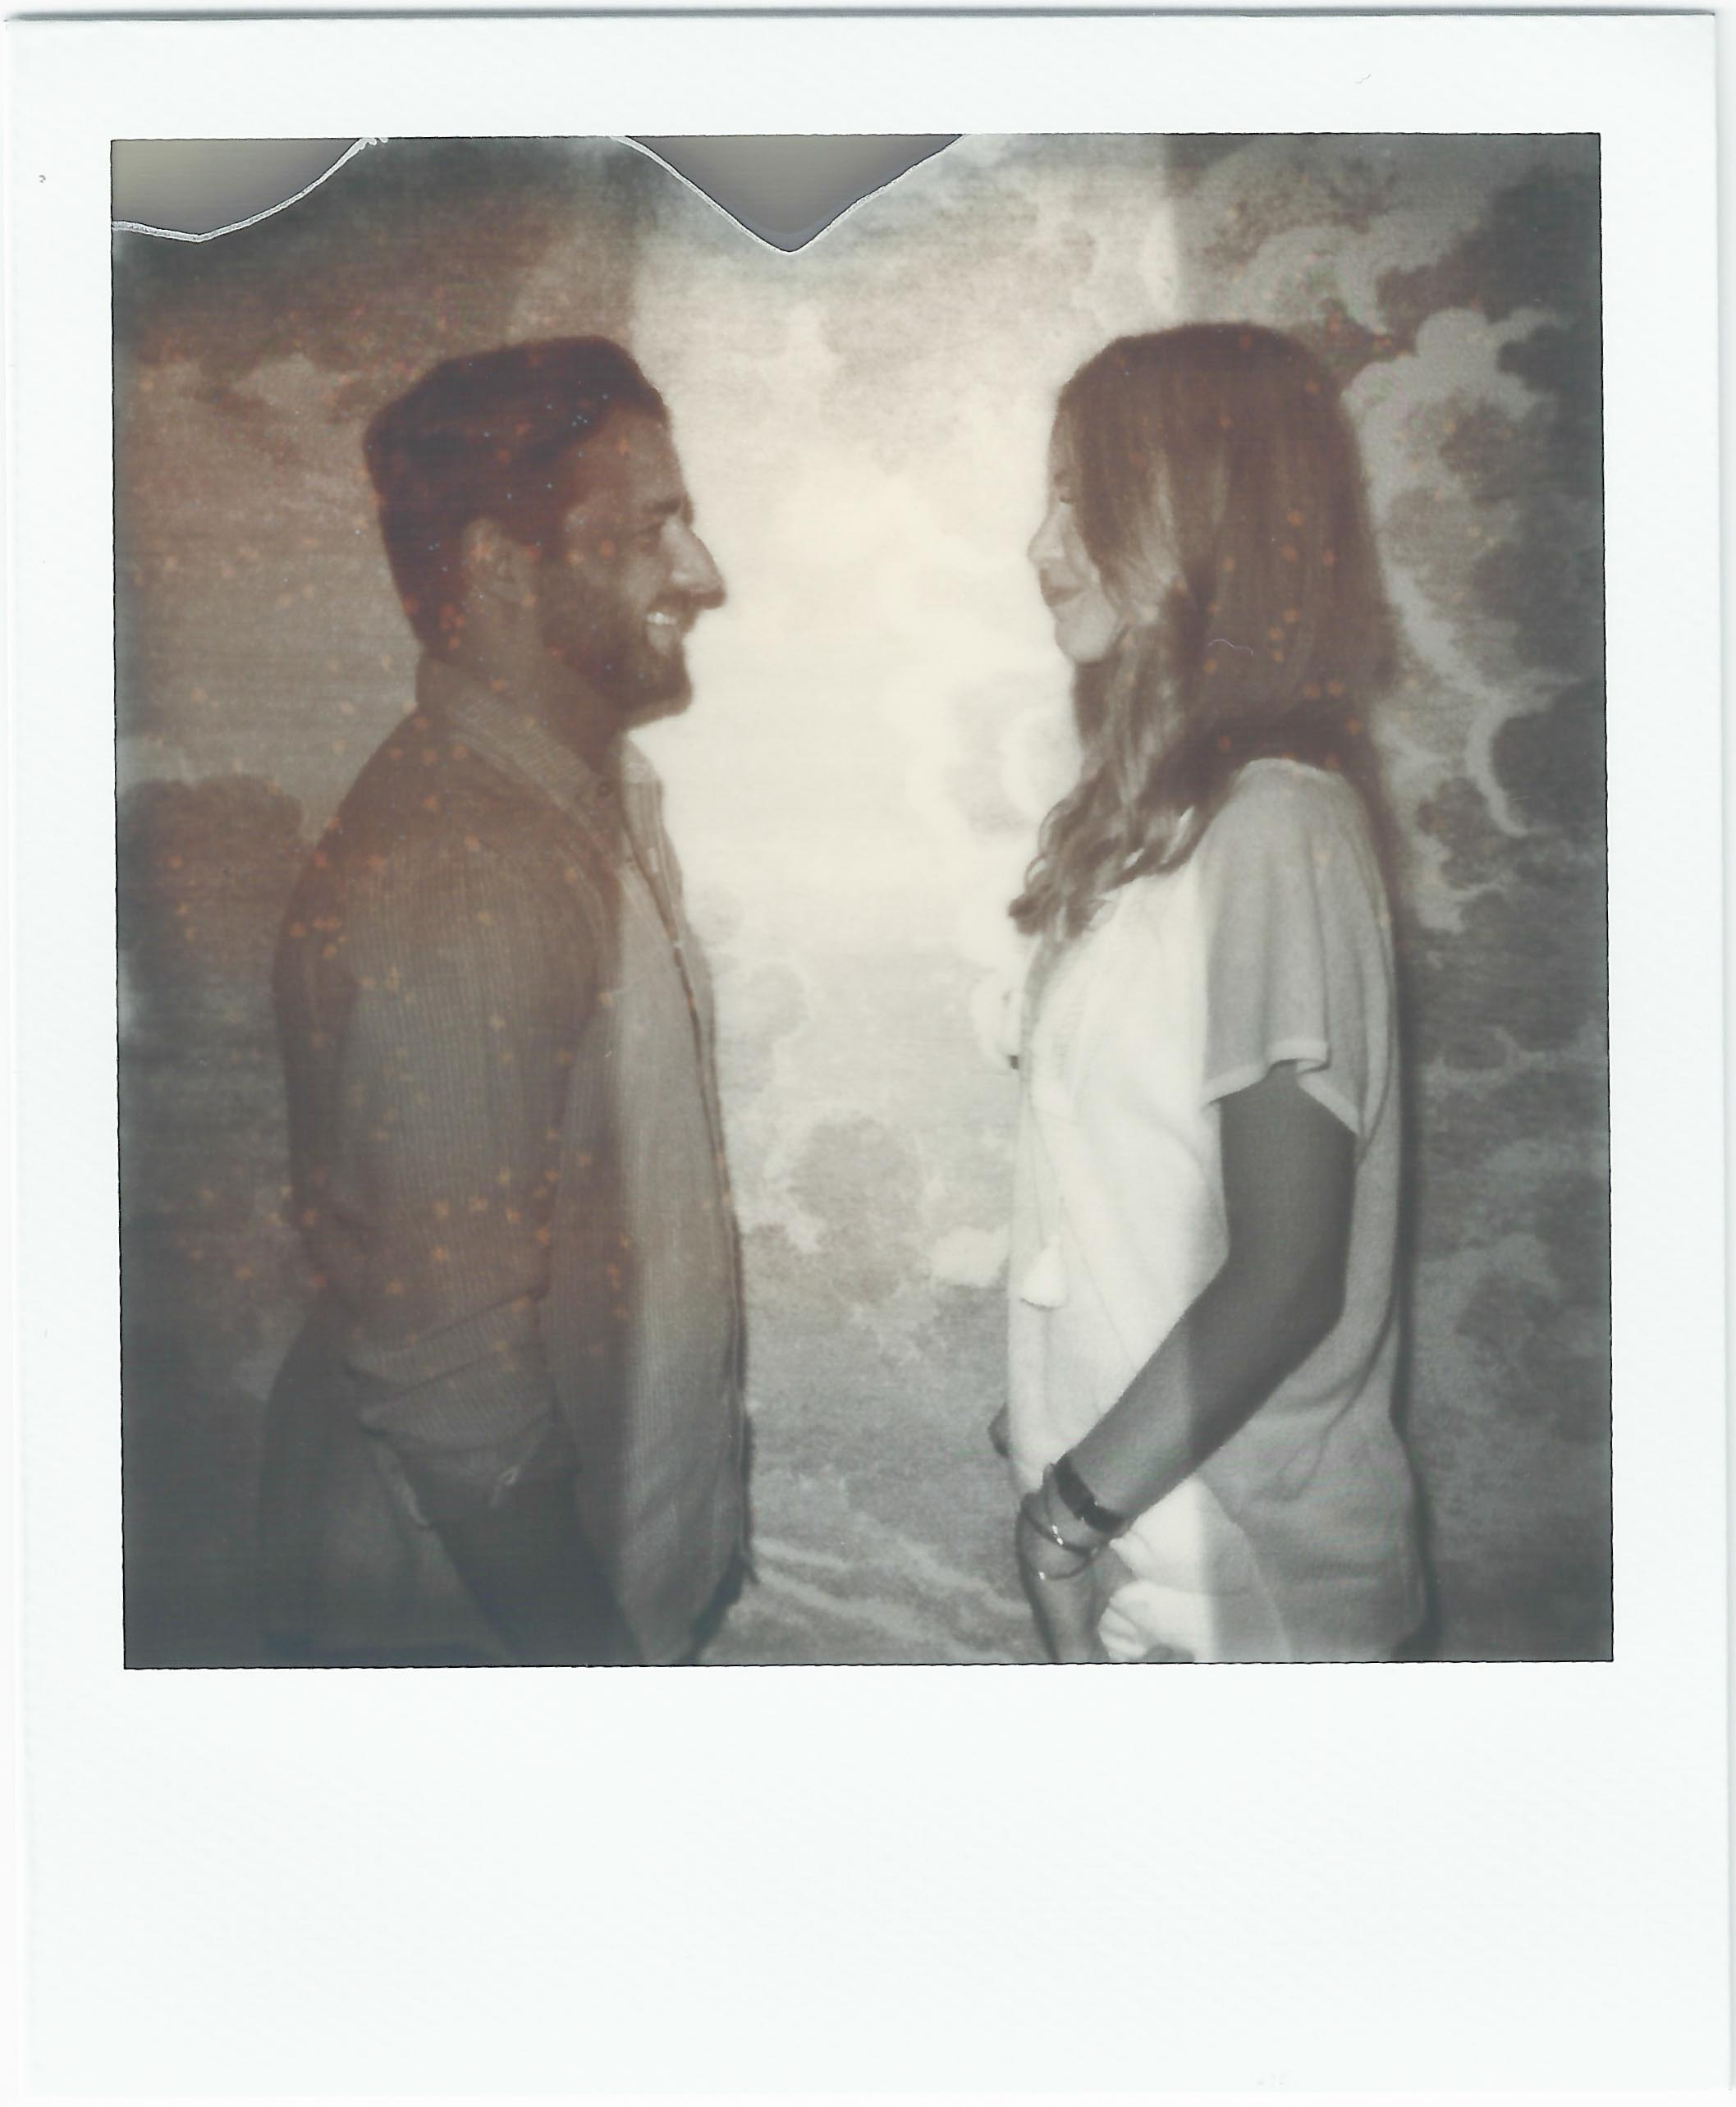 Dallas_Engagement_Wedding_Photographer-1.jpg